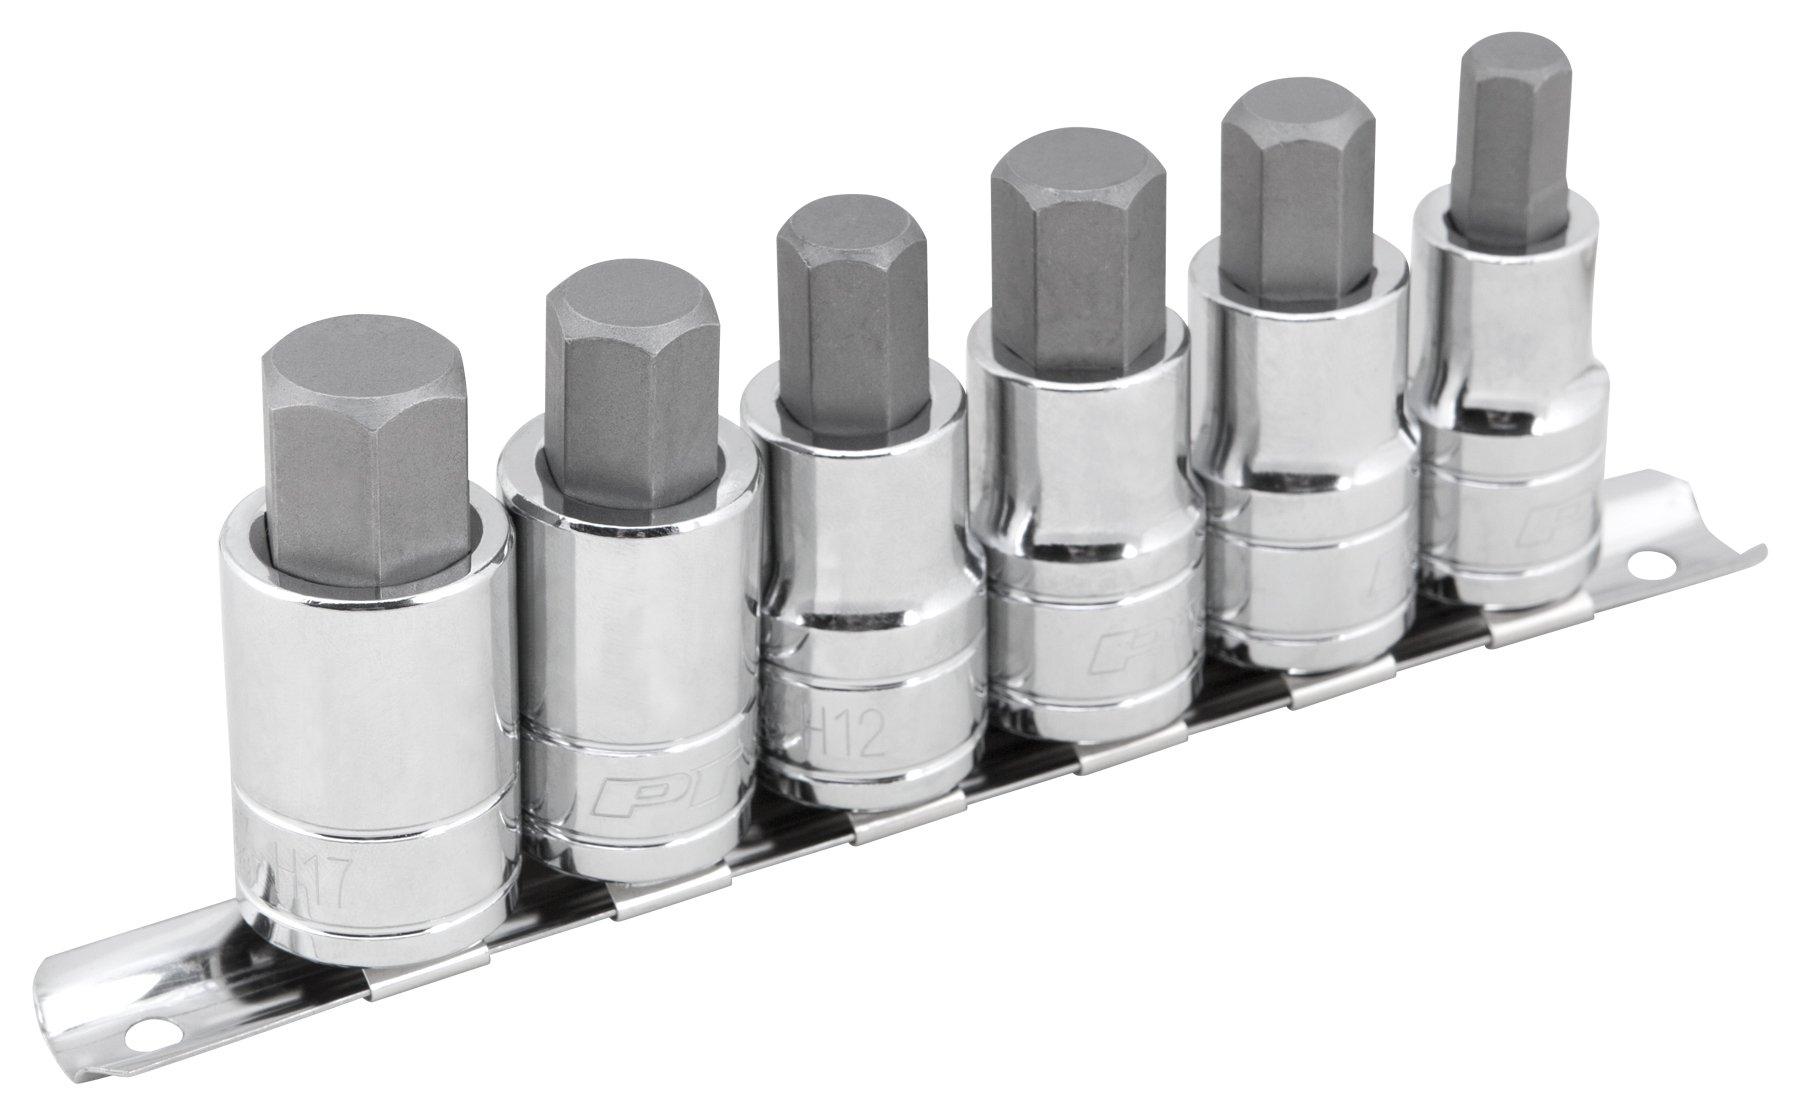 "Performance Tool W38886 6 Piece 1/2 Drive Large Hex Bit Socket Set 3/8"", 1/2"", 9/16"", 12 mm, 14 mm, 17 mm, NULL"